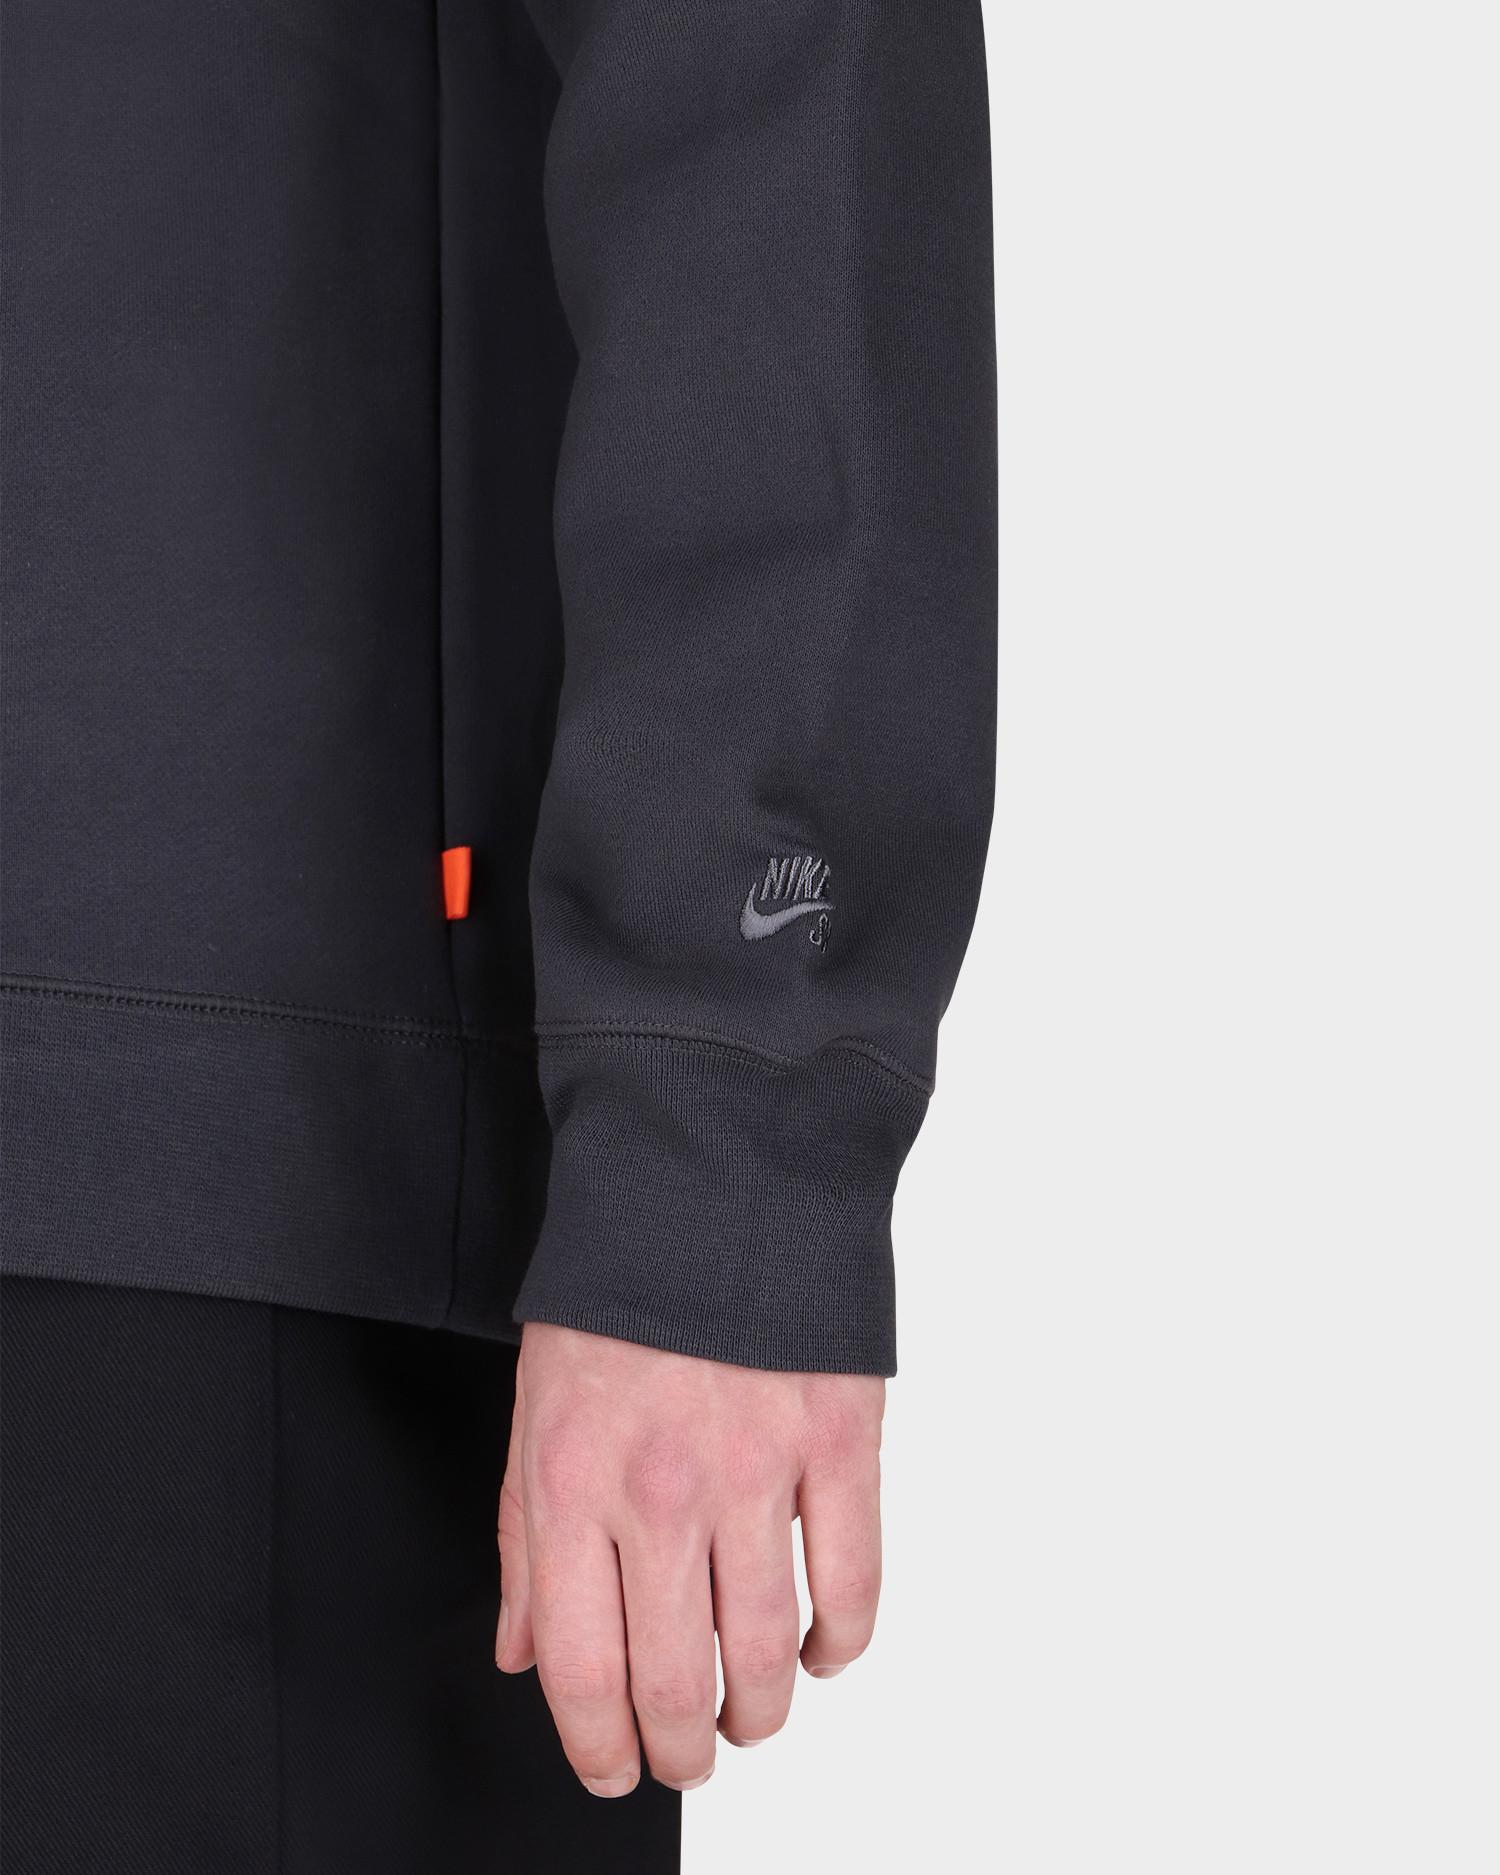 Nike Sb Orange Label Crewneck Smoke Grey/Smoke Grey